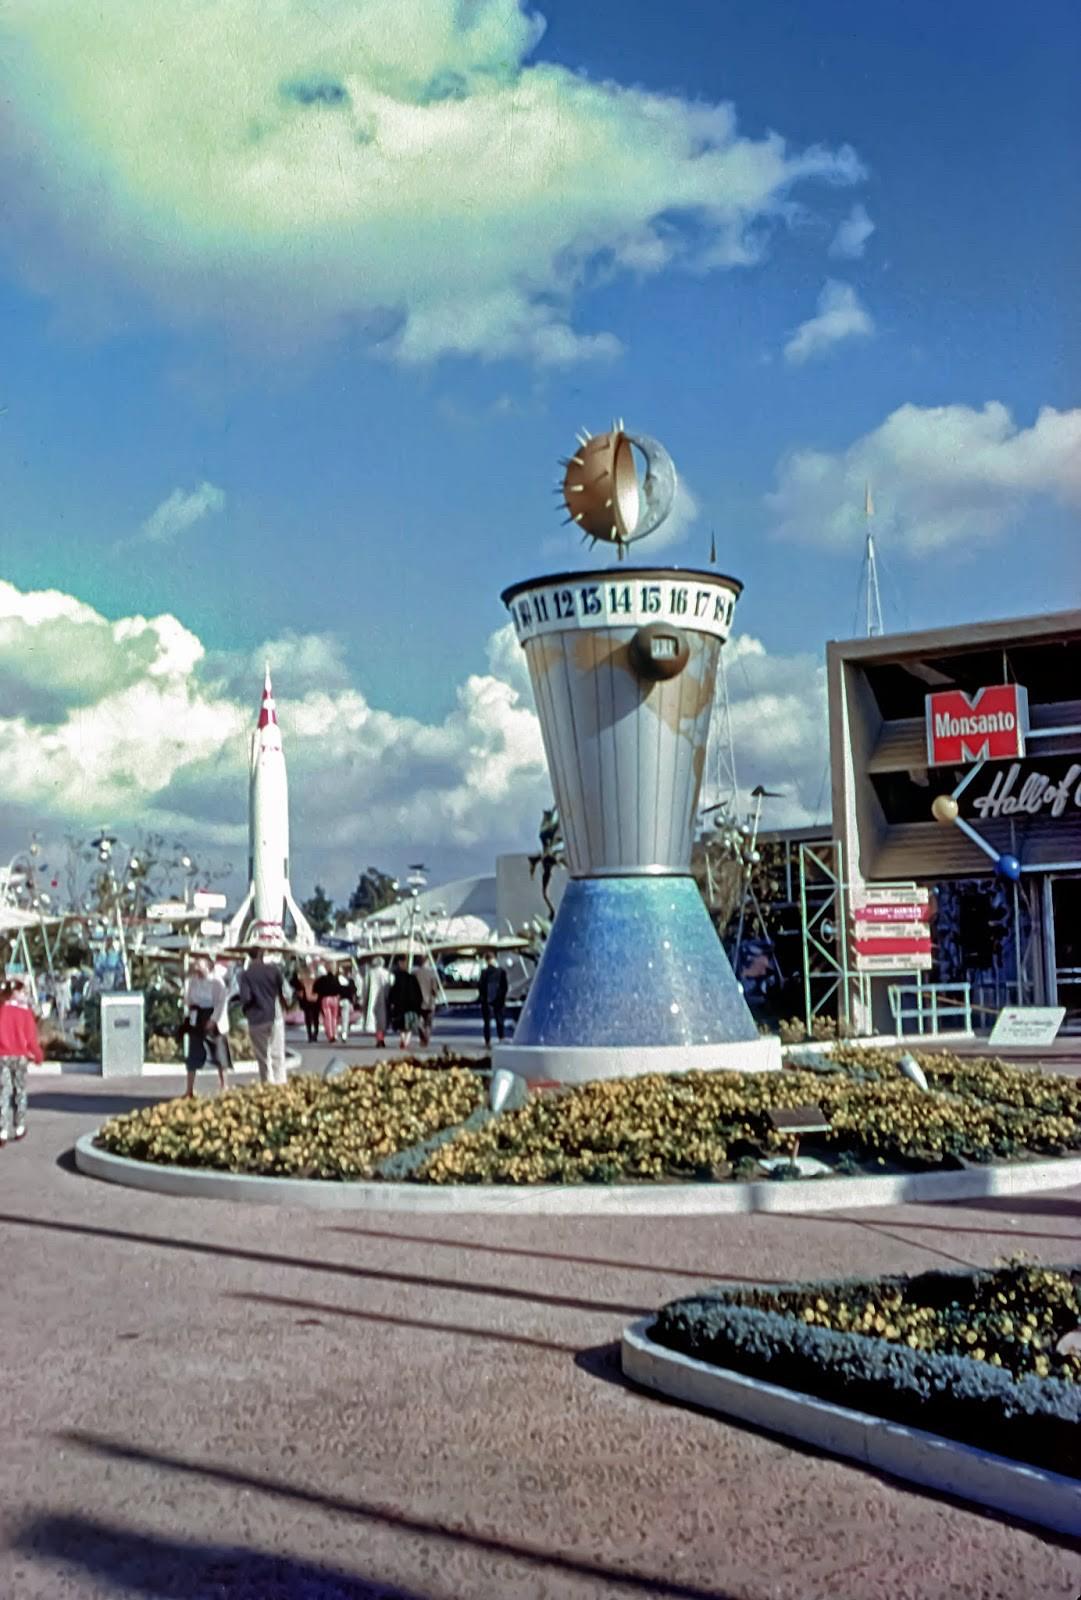 Daily Vintage Disneyland: The World Clock at Disneyland's Tomorrowland Facebook: